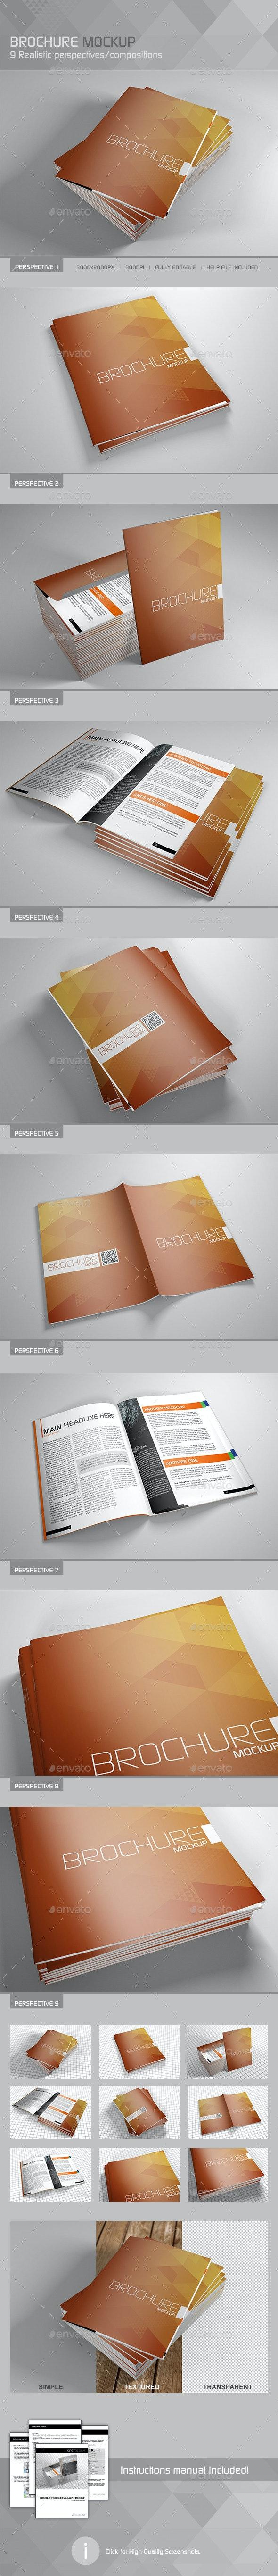 Realistic Brochure/Booklet/Magazine Mockup - Brochures Print